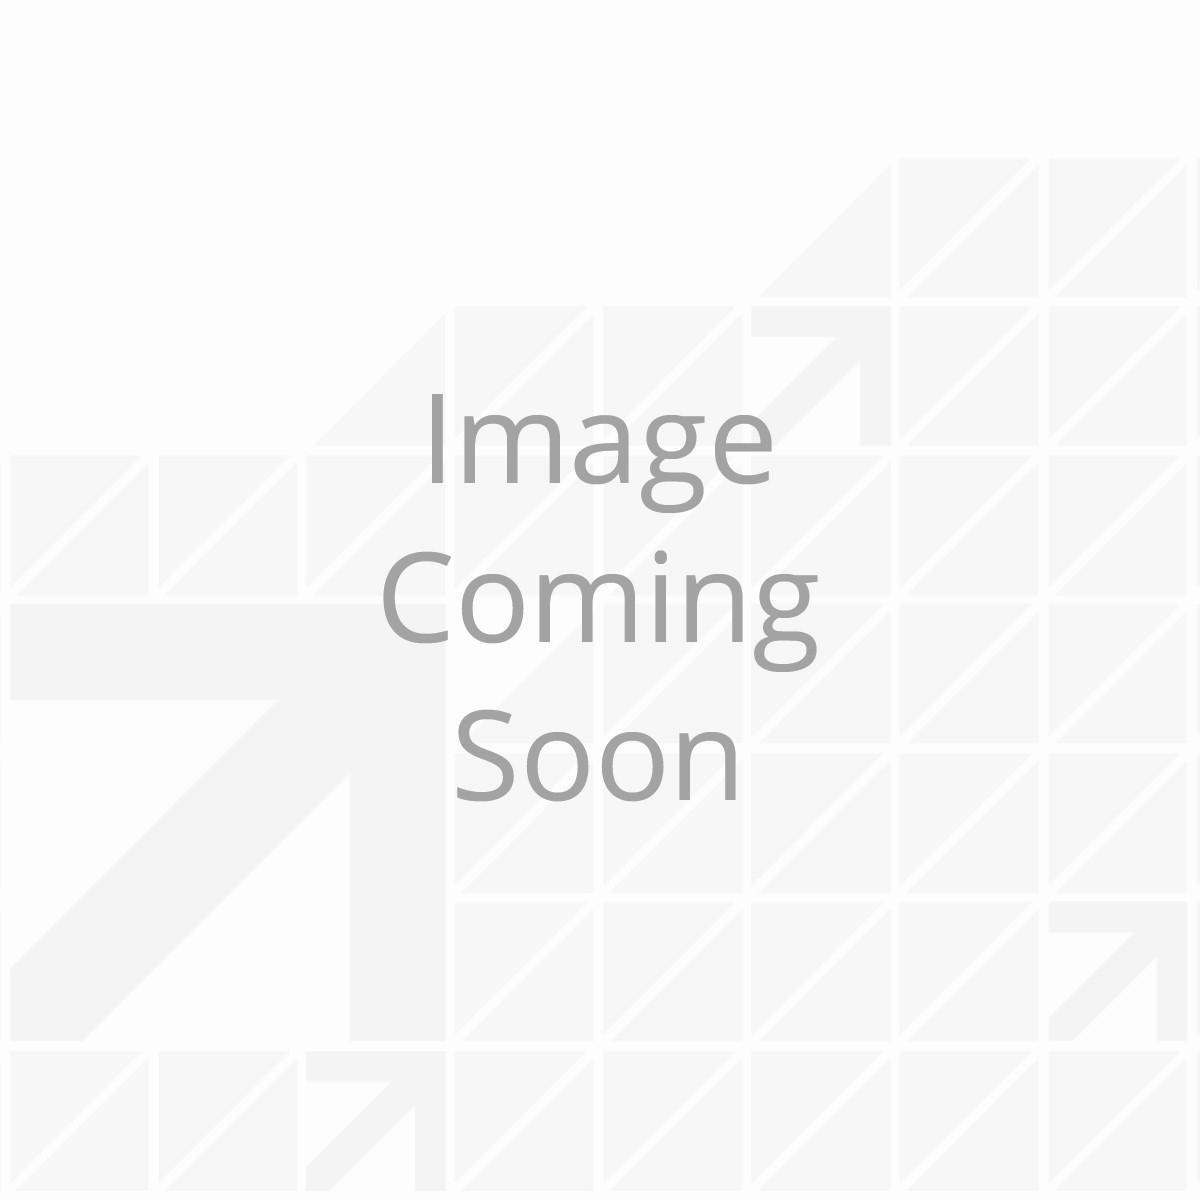 10' Awnbrella™ Fabric Support Kit - 3 Bows